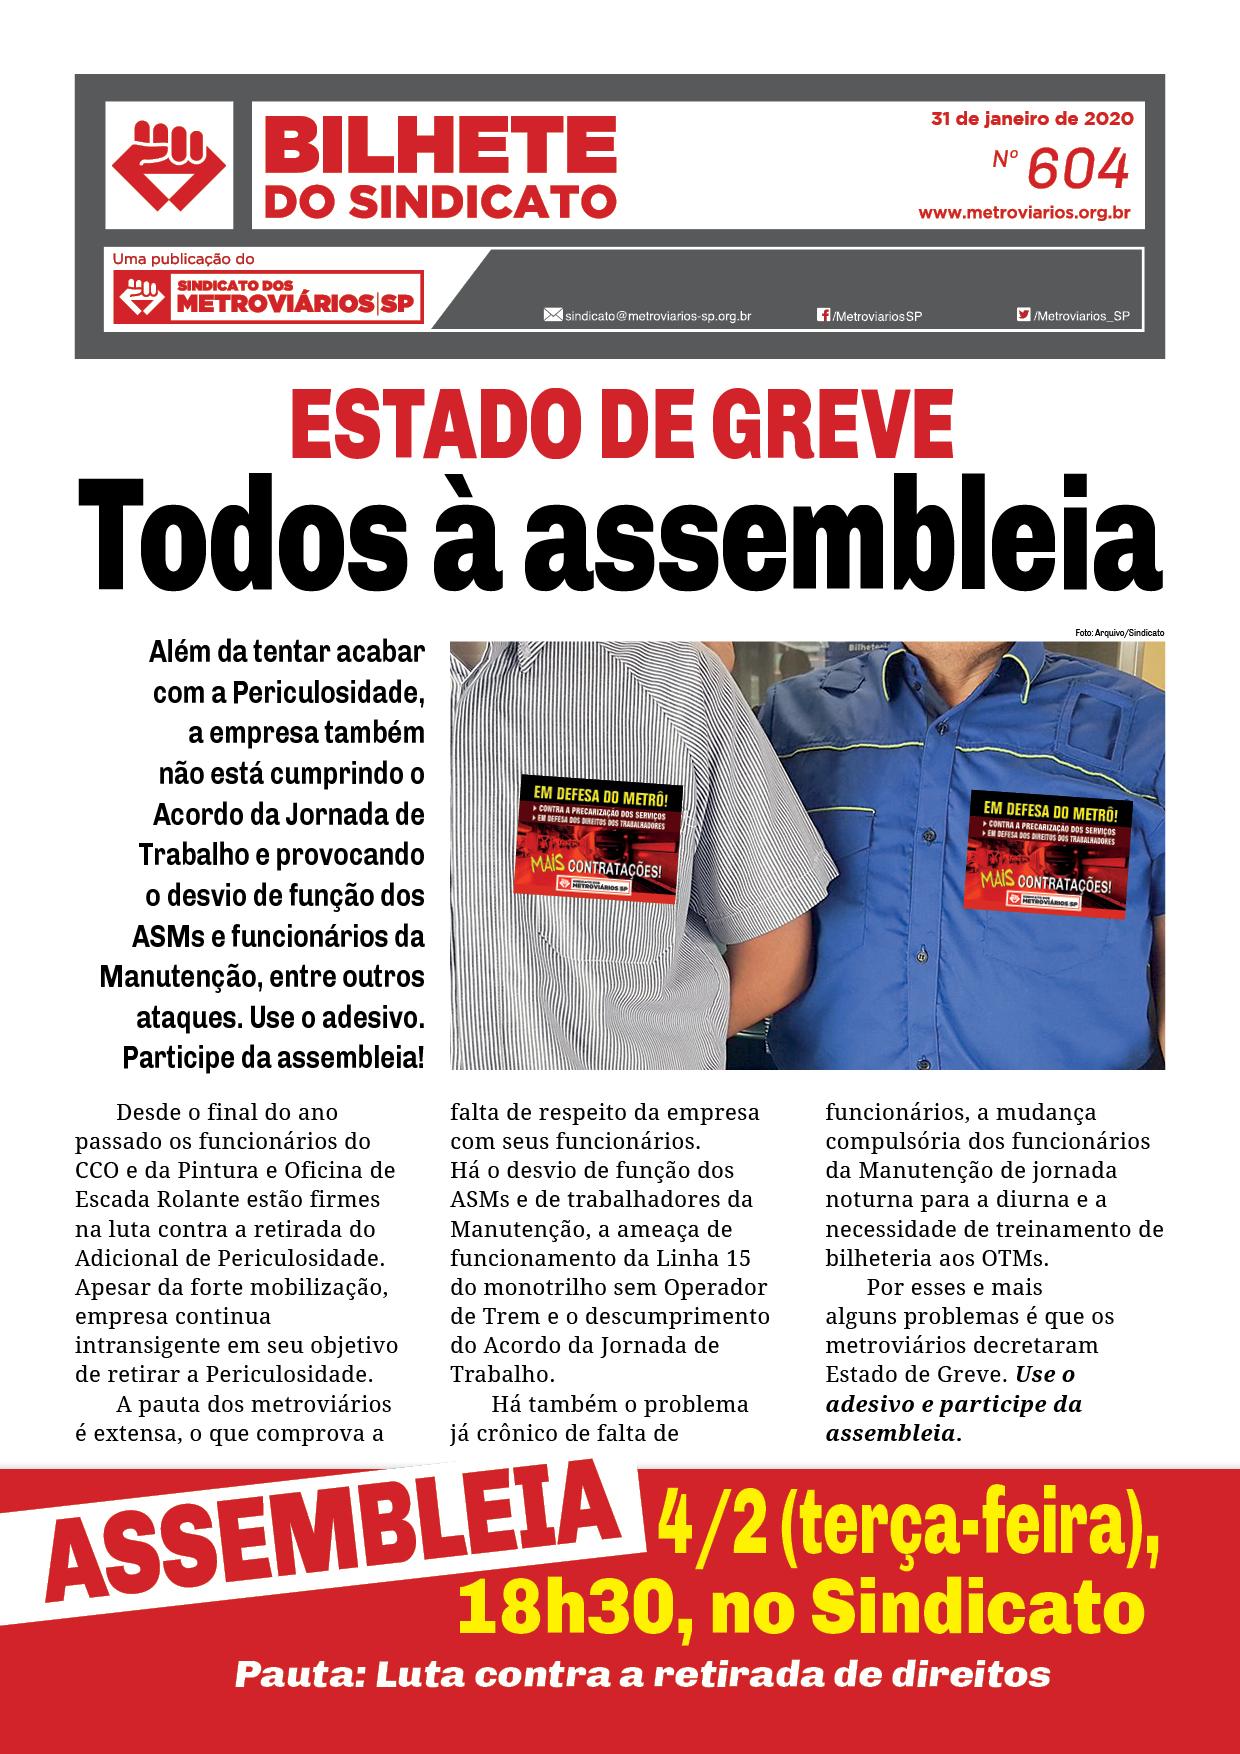 http://www.metroviarios.org.br/site/wp-content/files_mf/1580488260bi_604.pdf